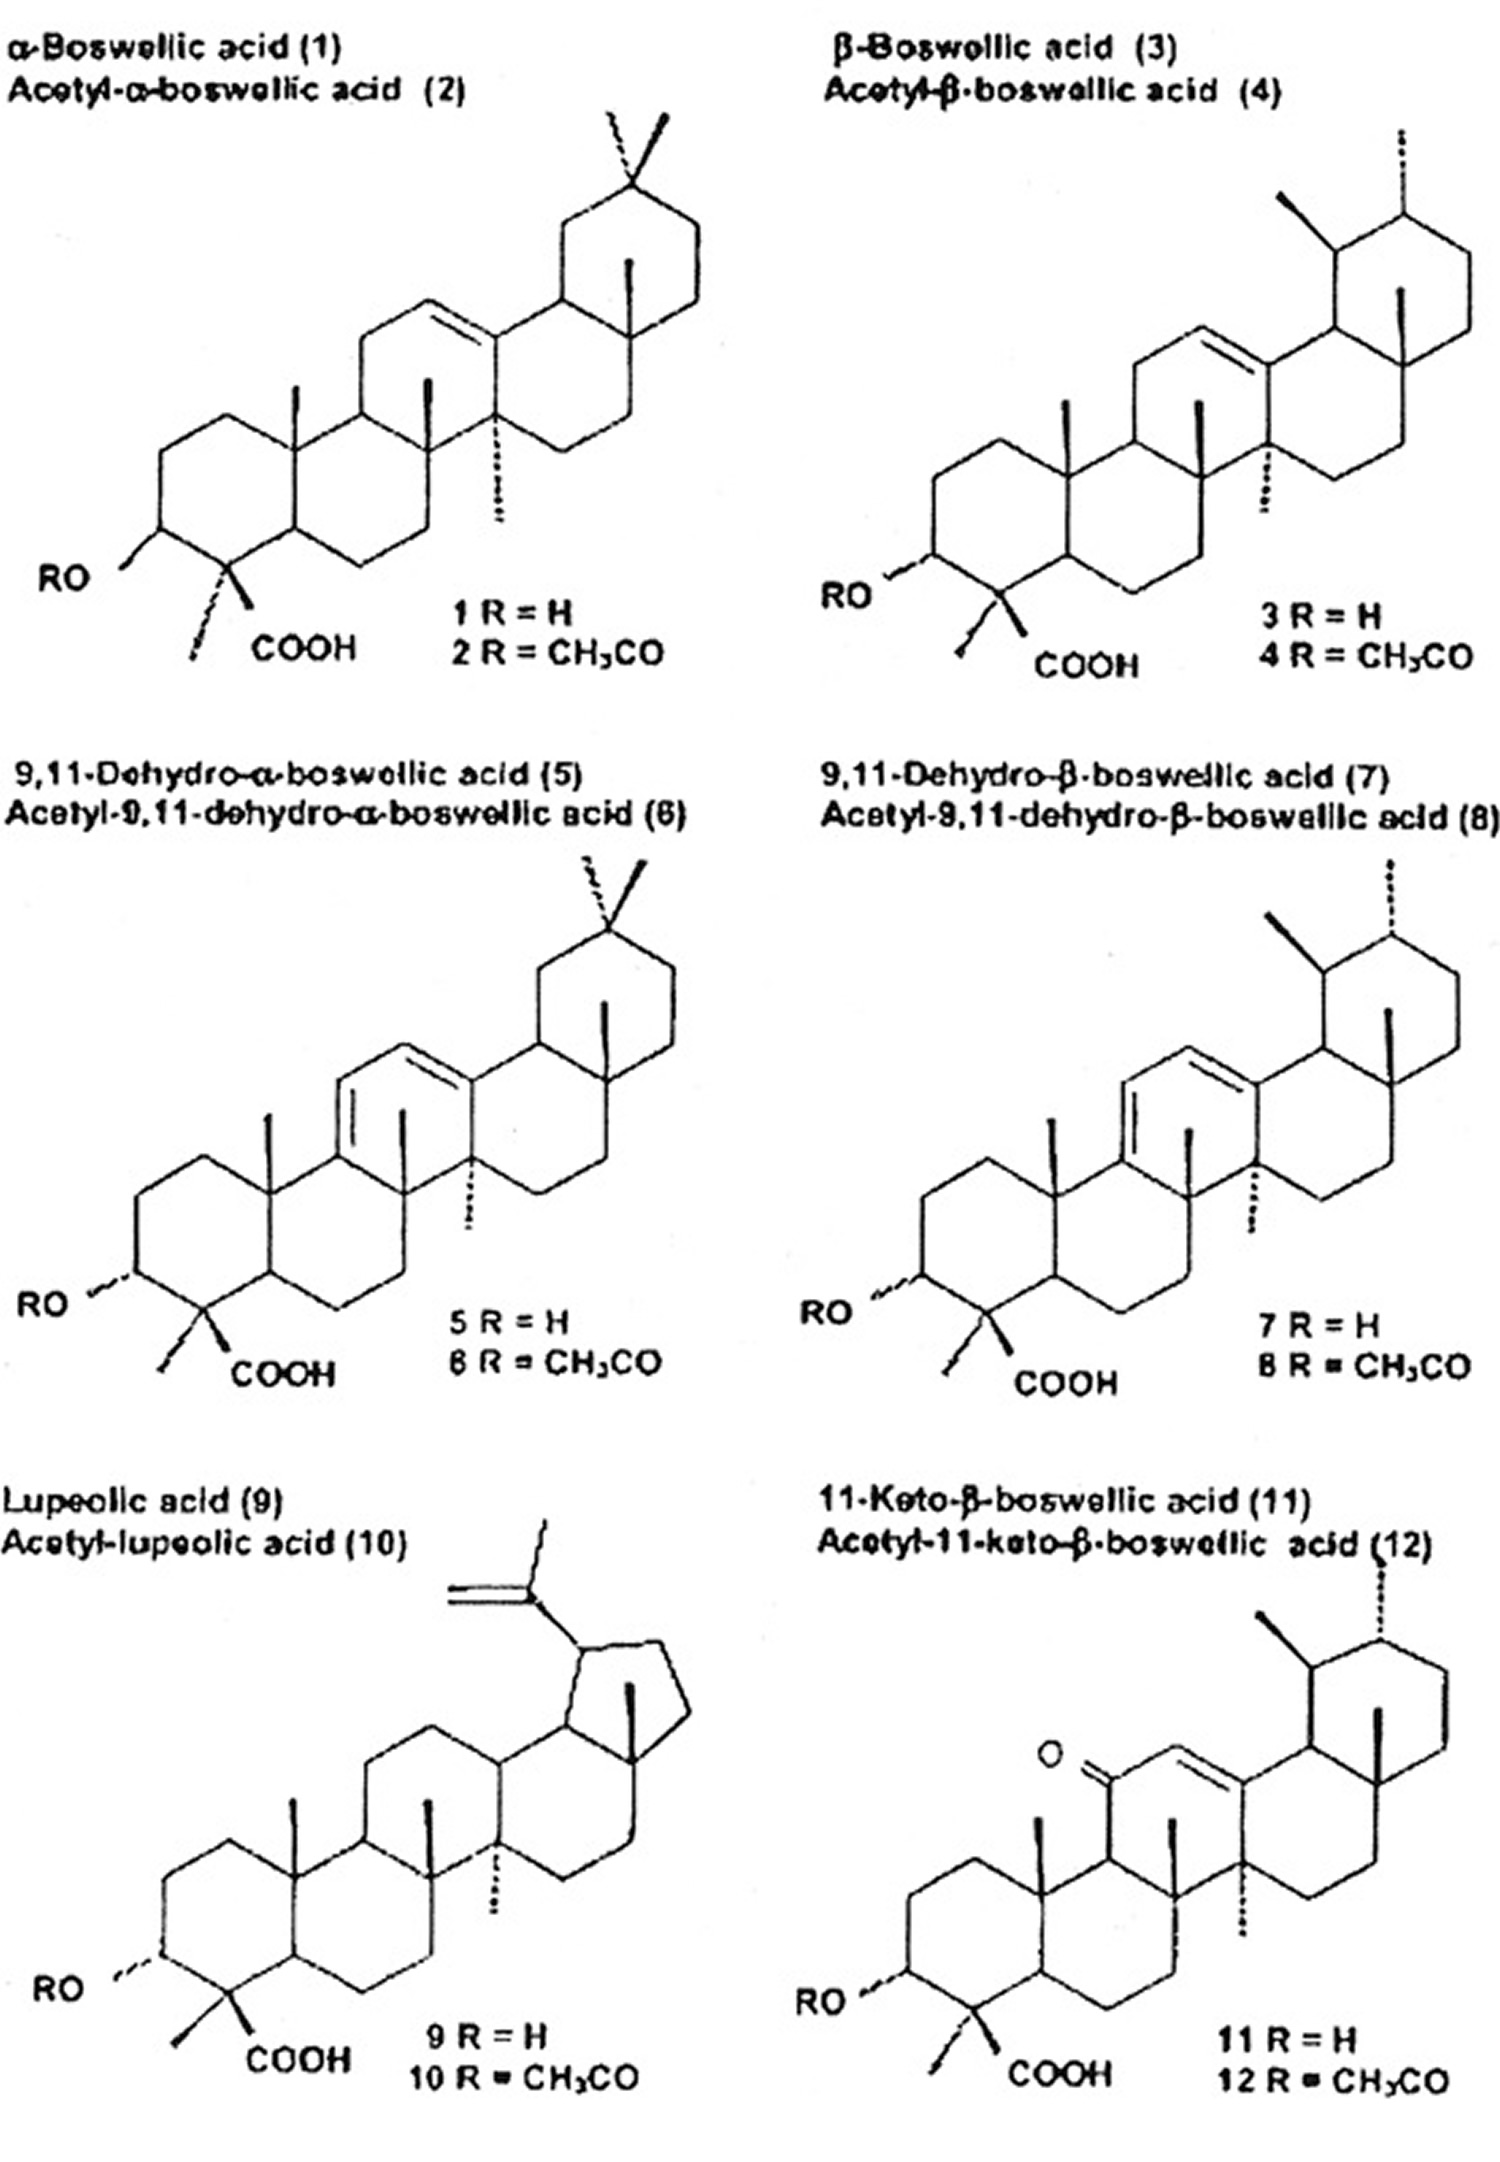 triterpenic acids present in frankincense